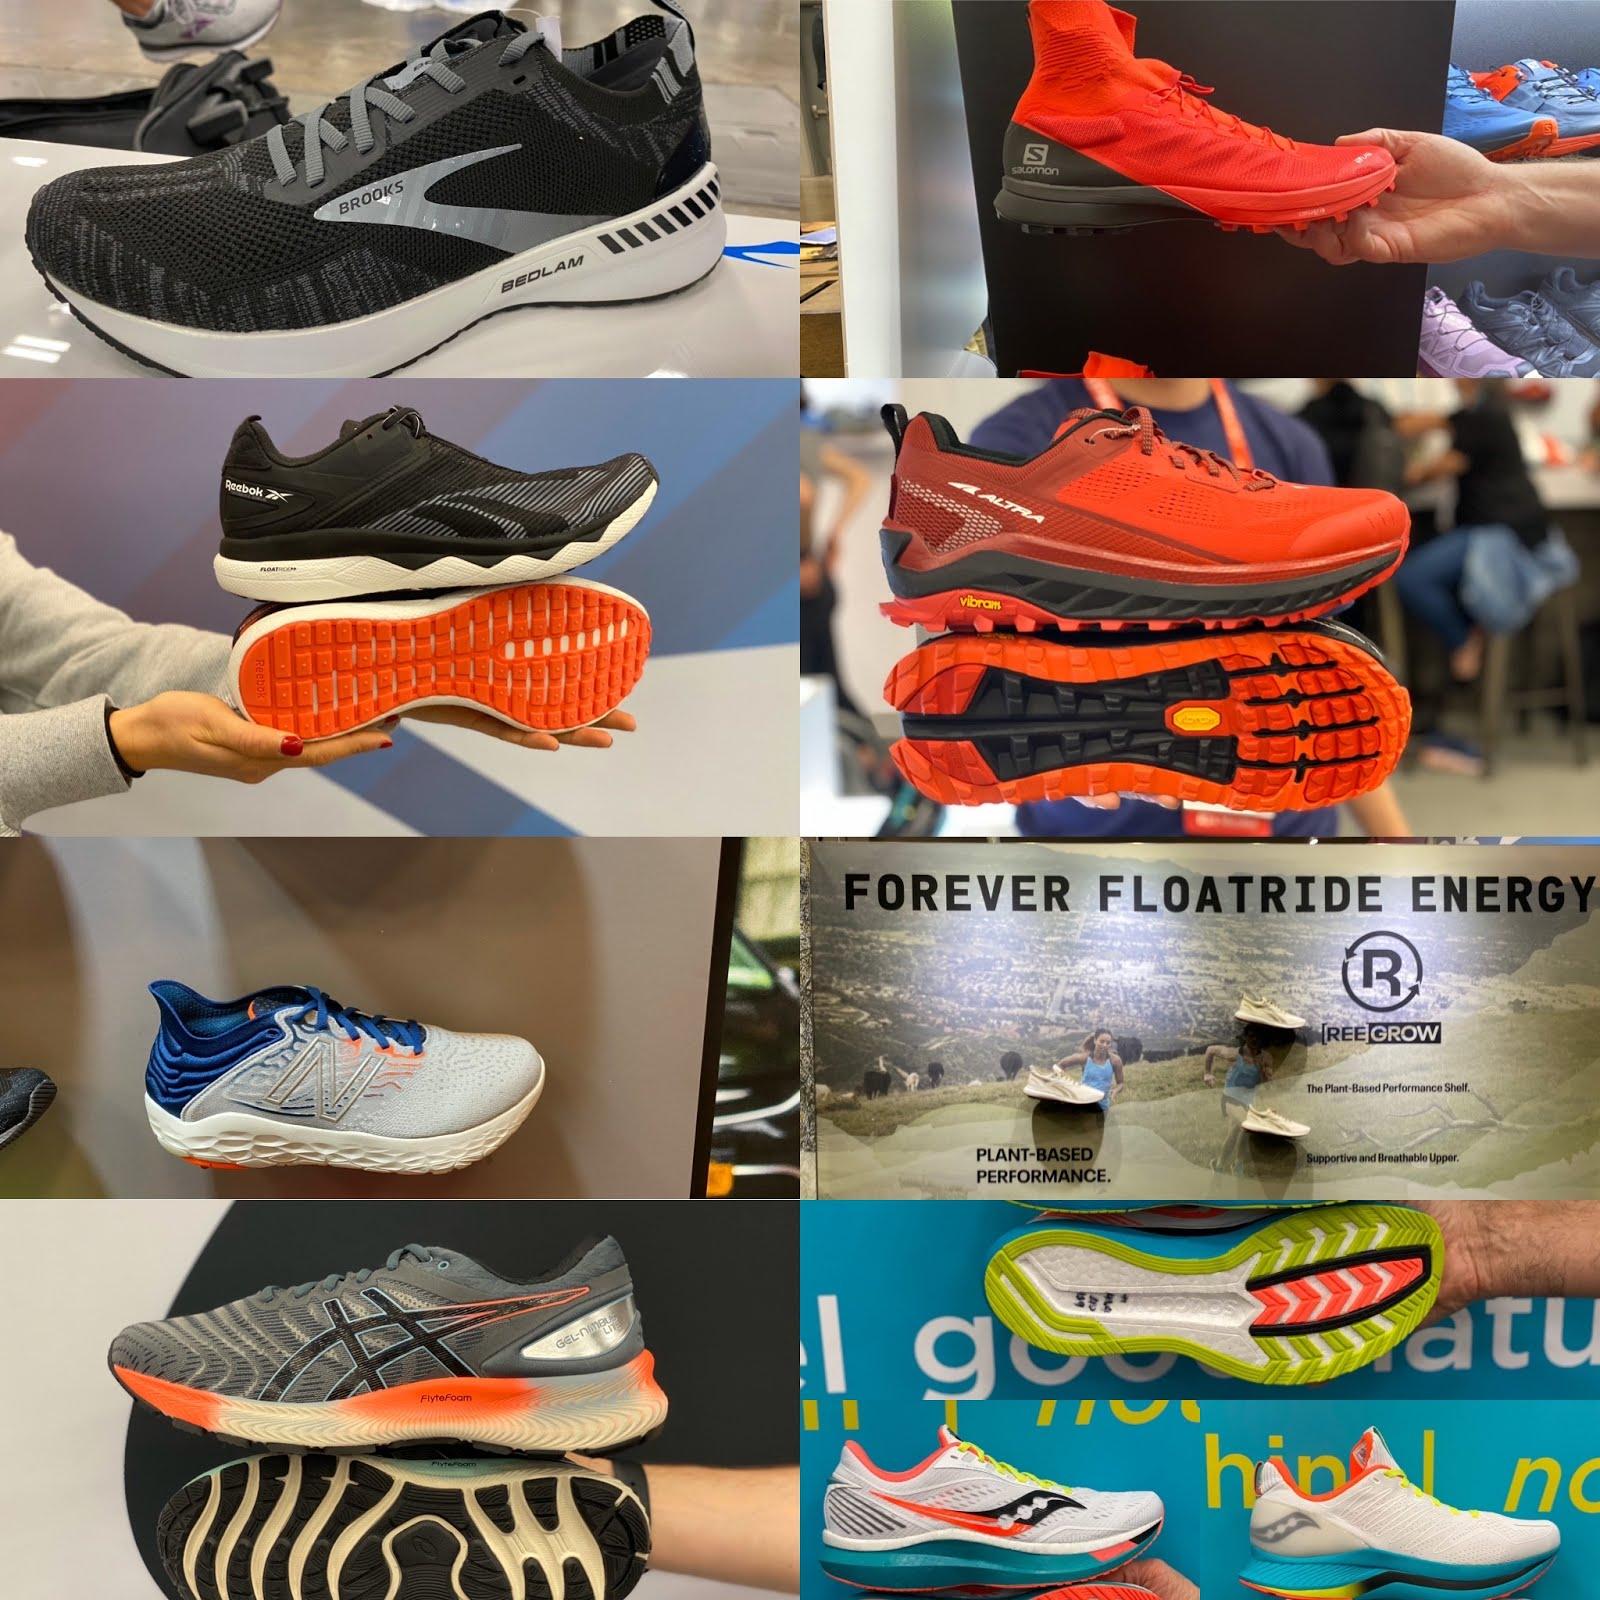 10 Best Salomon Running Shoes Reviewed in 2020 | WalkJogRun